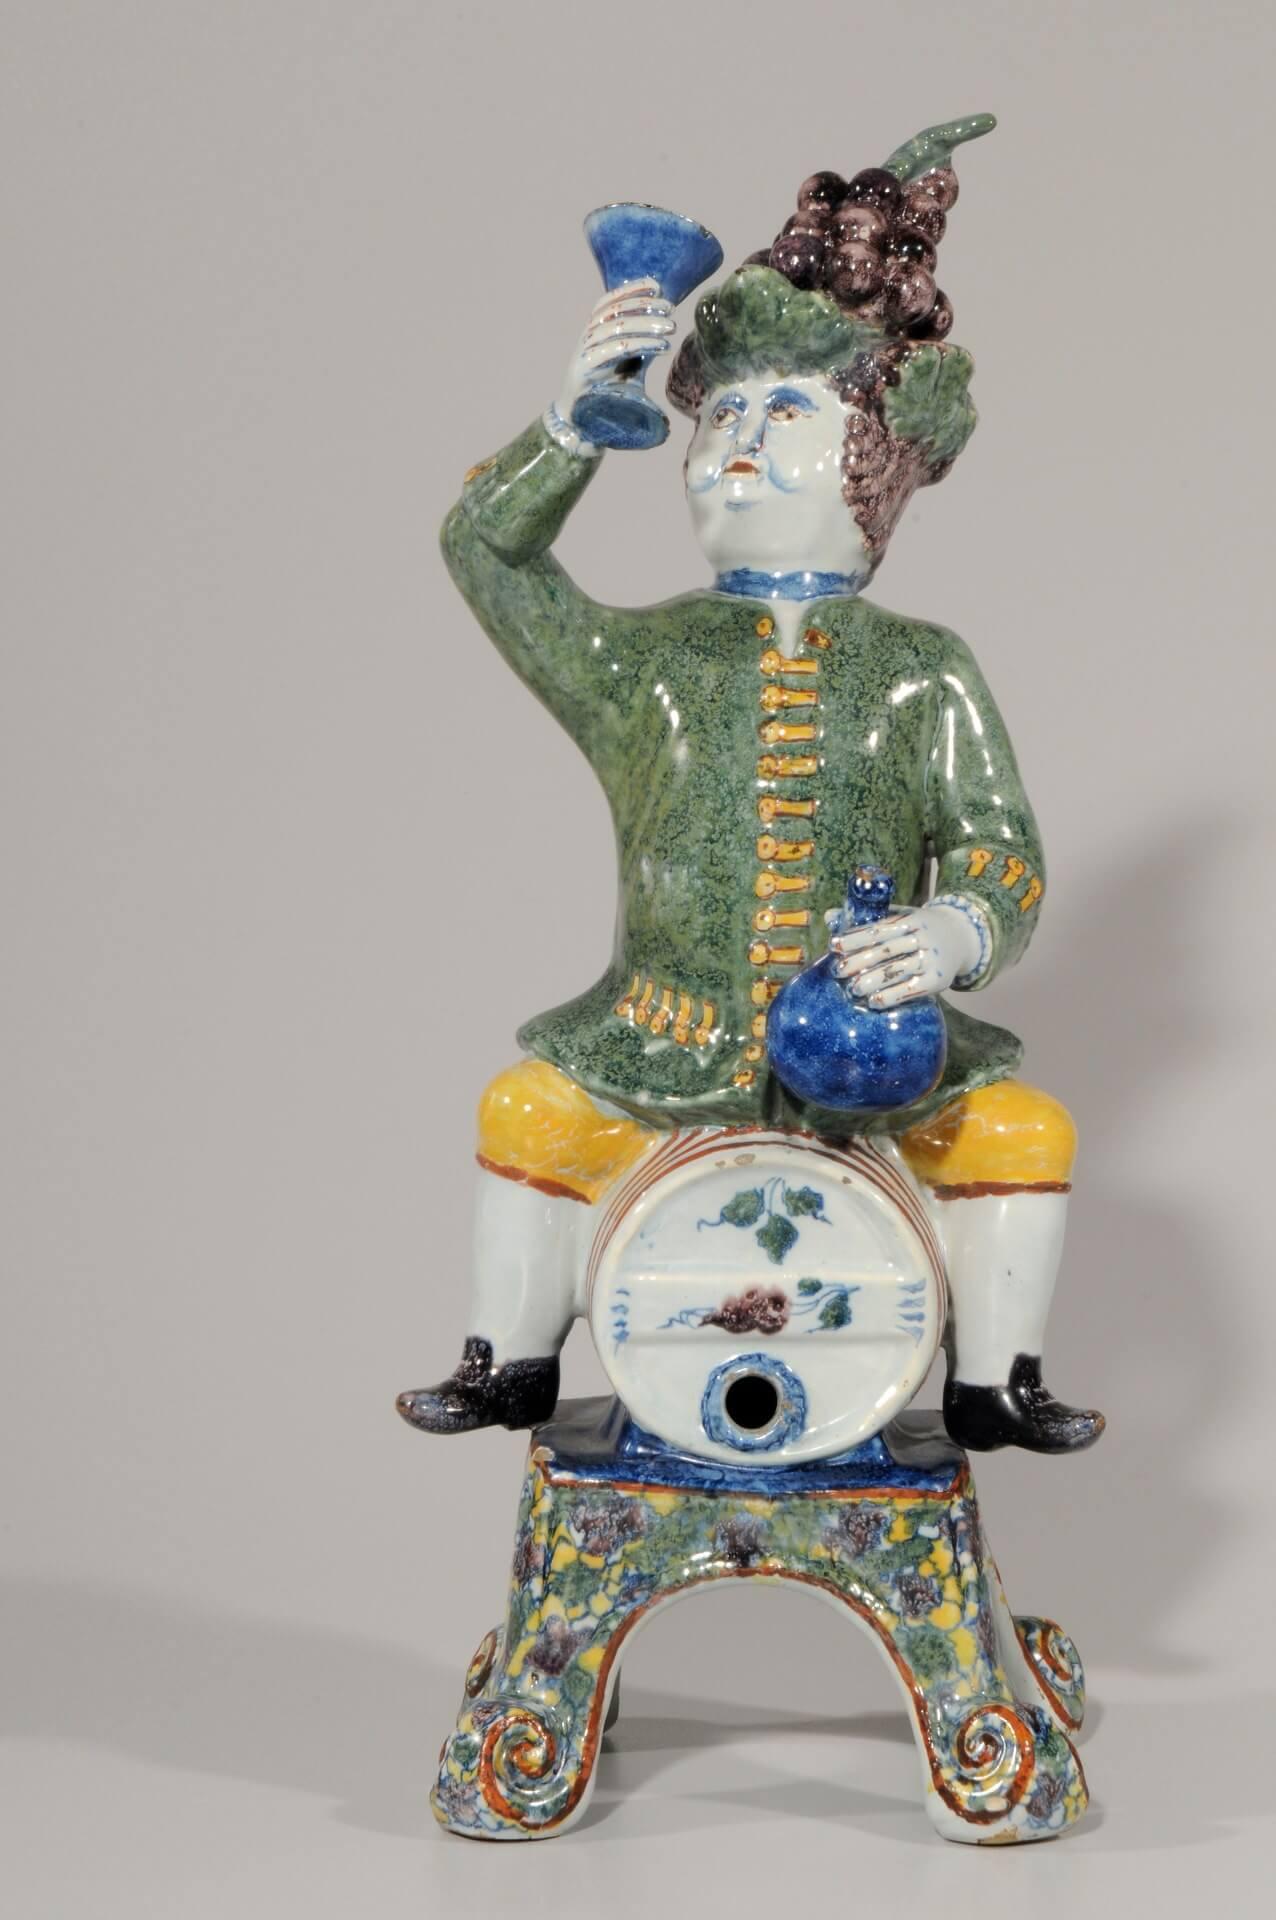 Aronson Antiquairs old antique polychrome figurine of man sitting on barrel